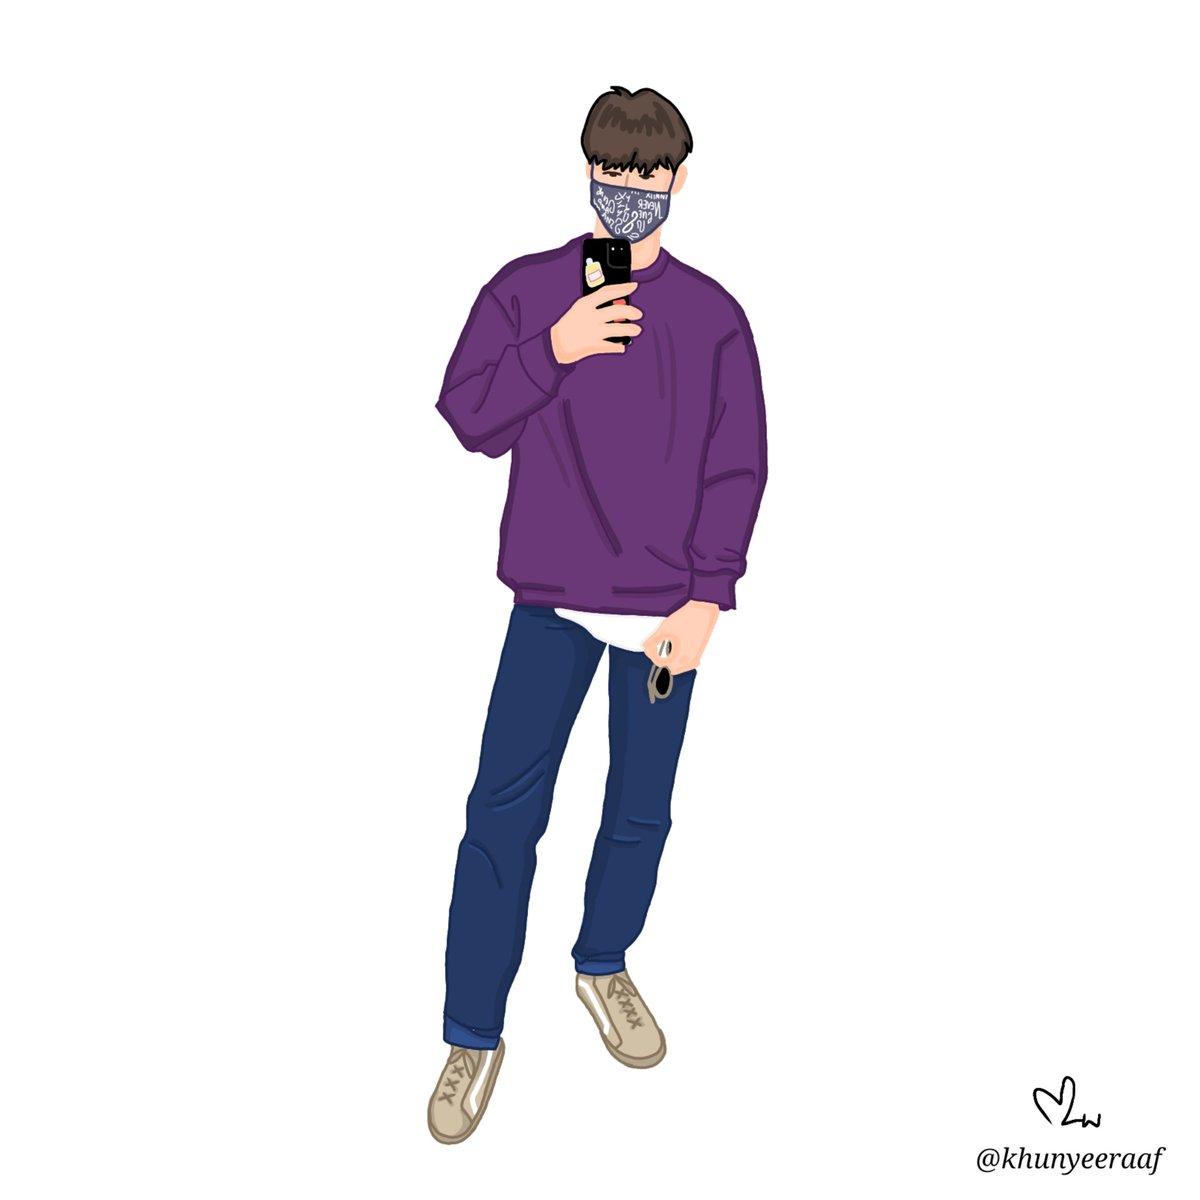 Luv u purple ~~@Tawan_V #Tawan_V #ชาวบ้านจิตรกรpic.twitter.com/lCHBdYFlzT